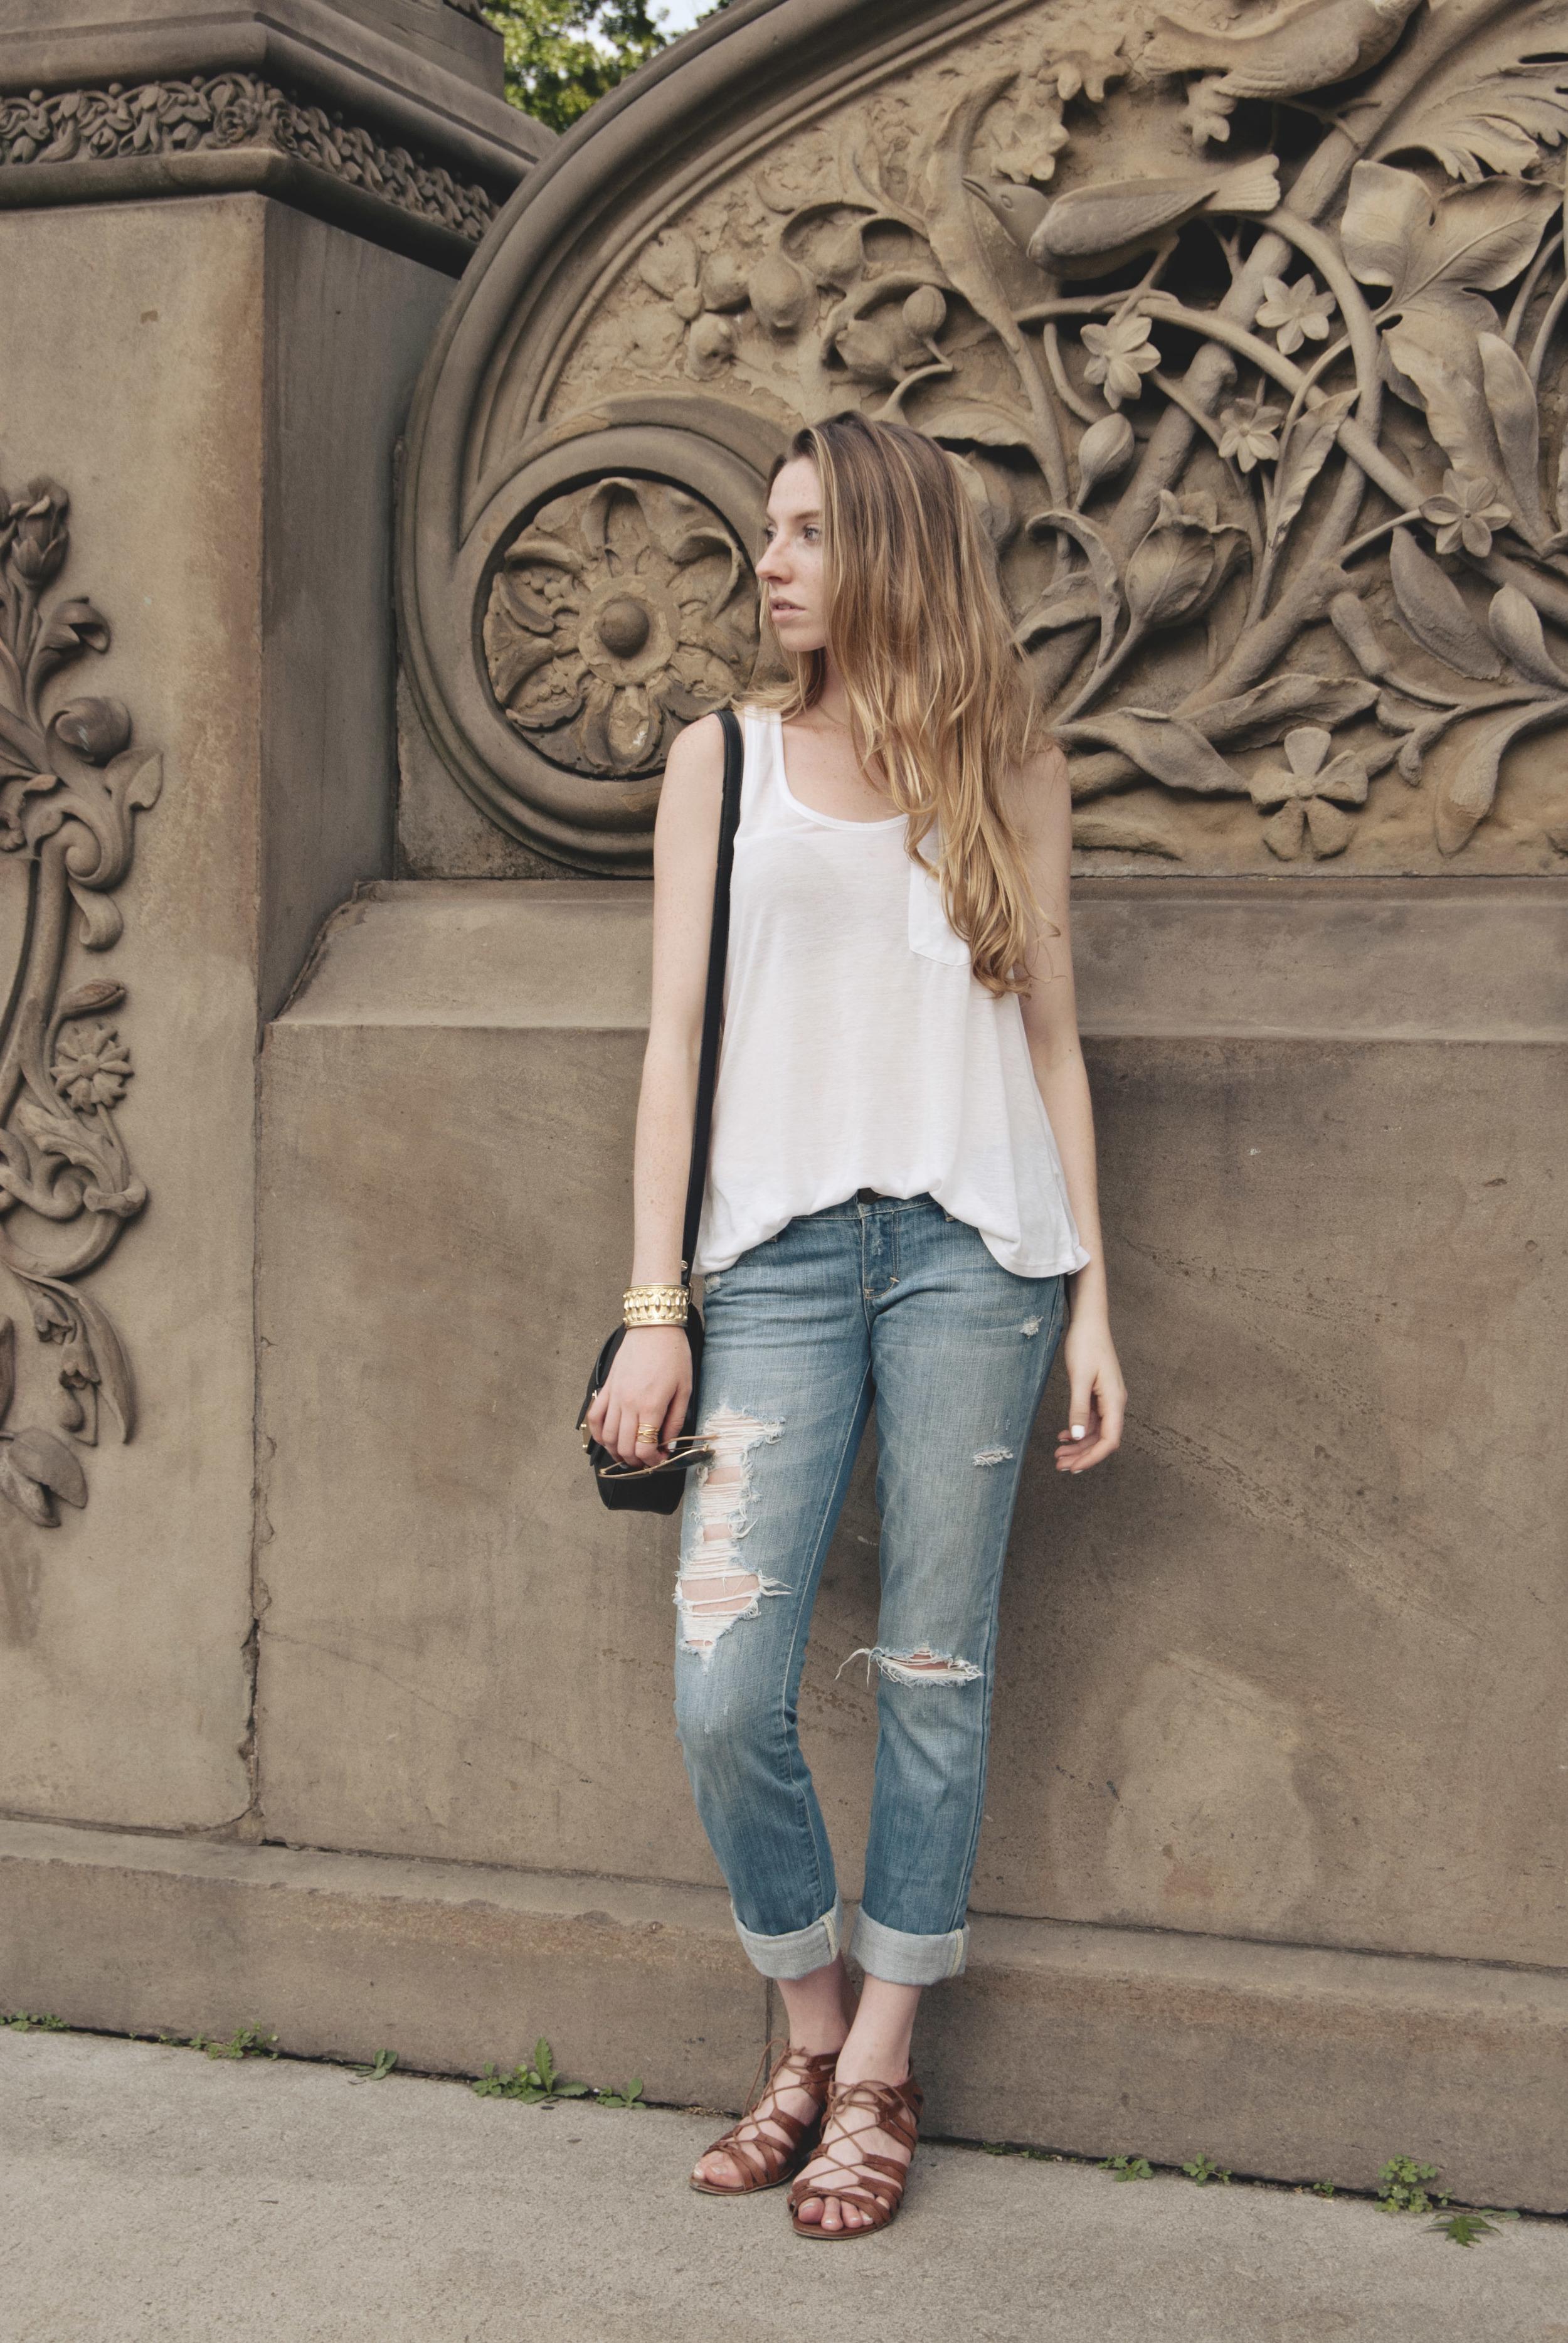 Dressed Up Ripped Distressed Denim (via Girl x Garment)